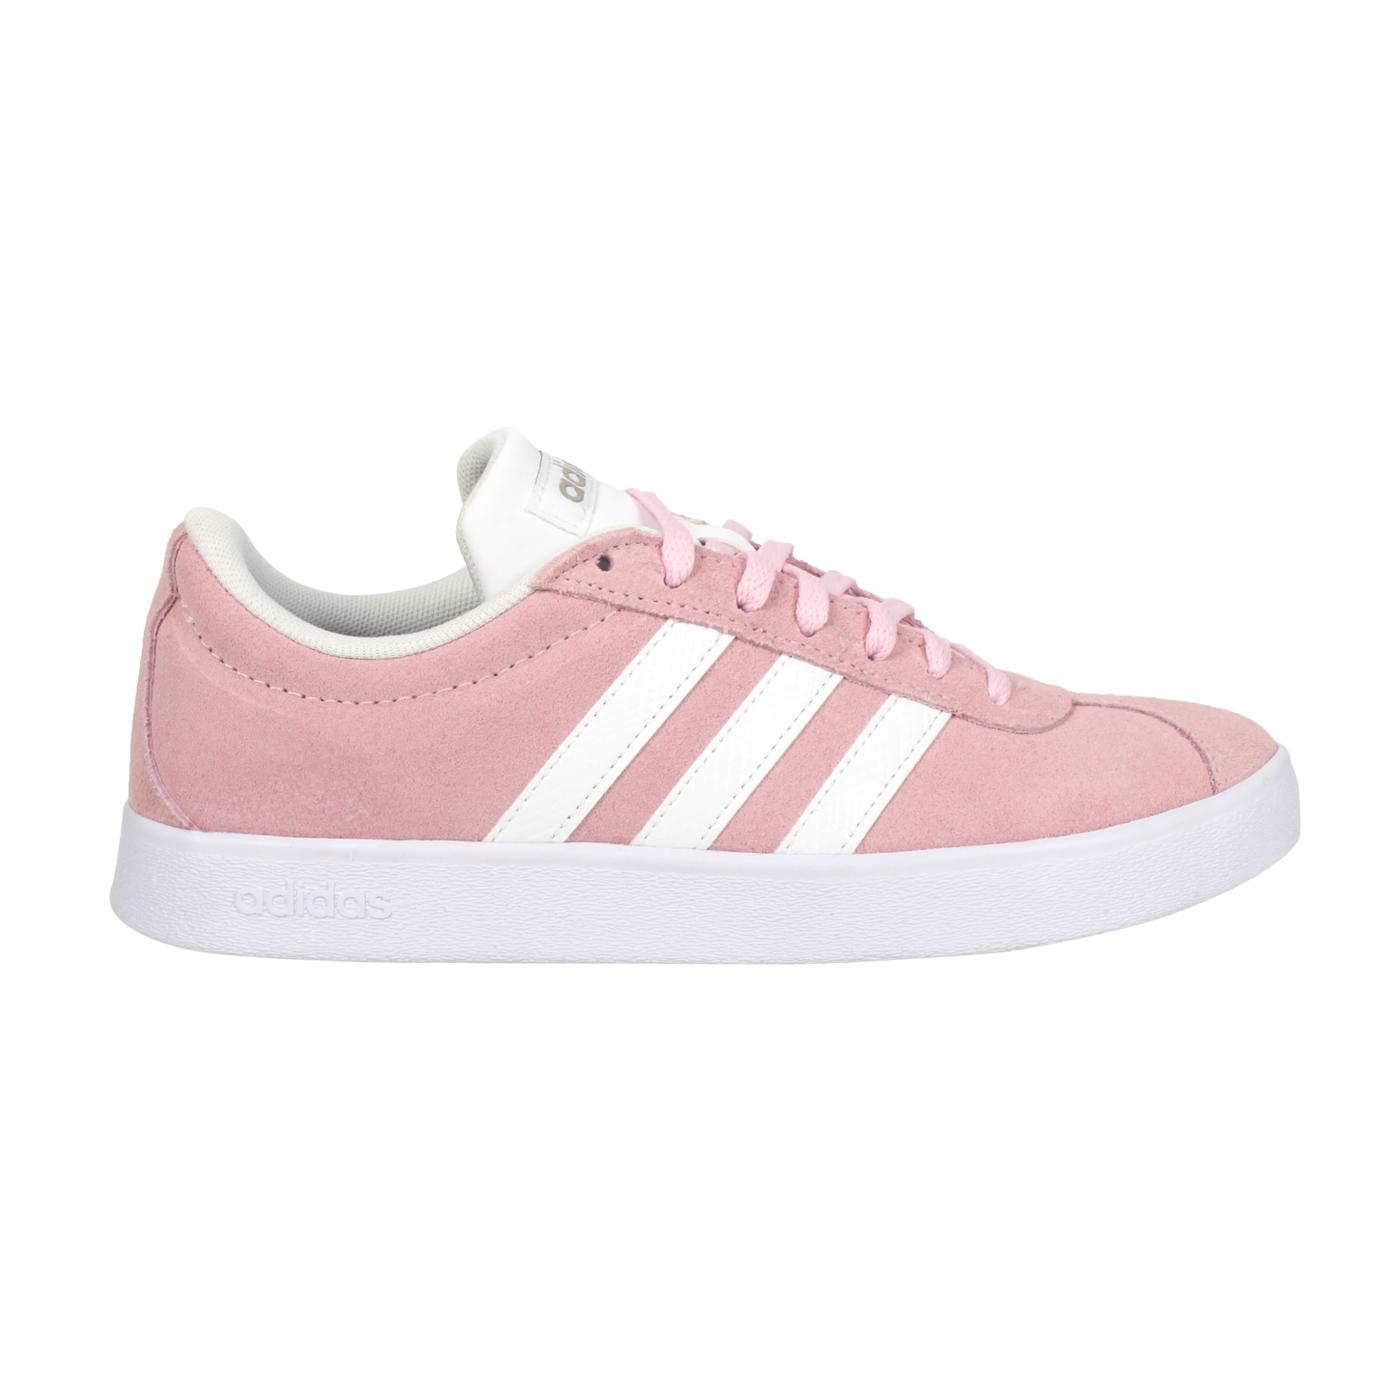 ADIDAS 女款休閒運動鞋  @VL COURT 2.0@FY8811 - 粉紅白